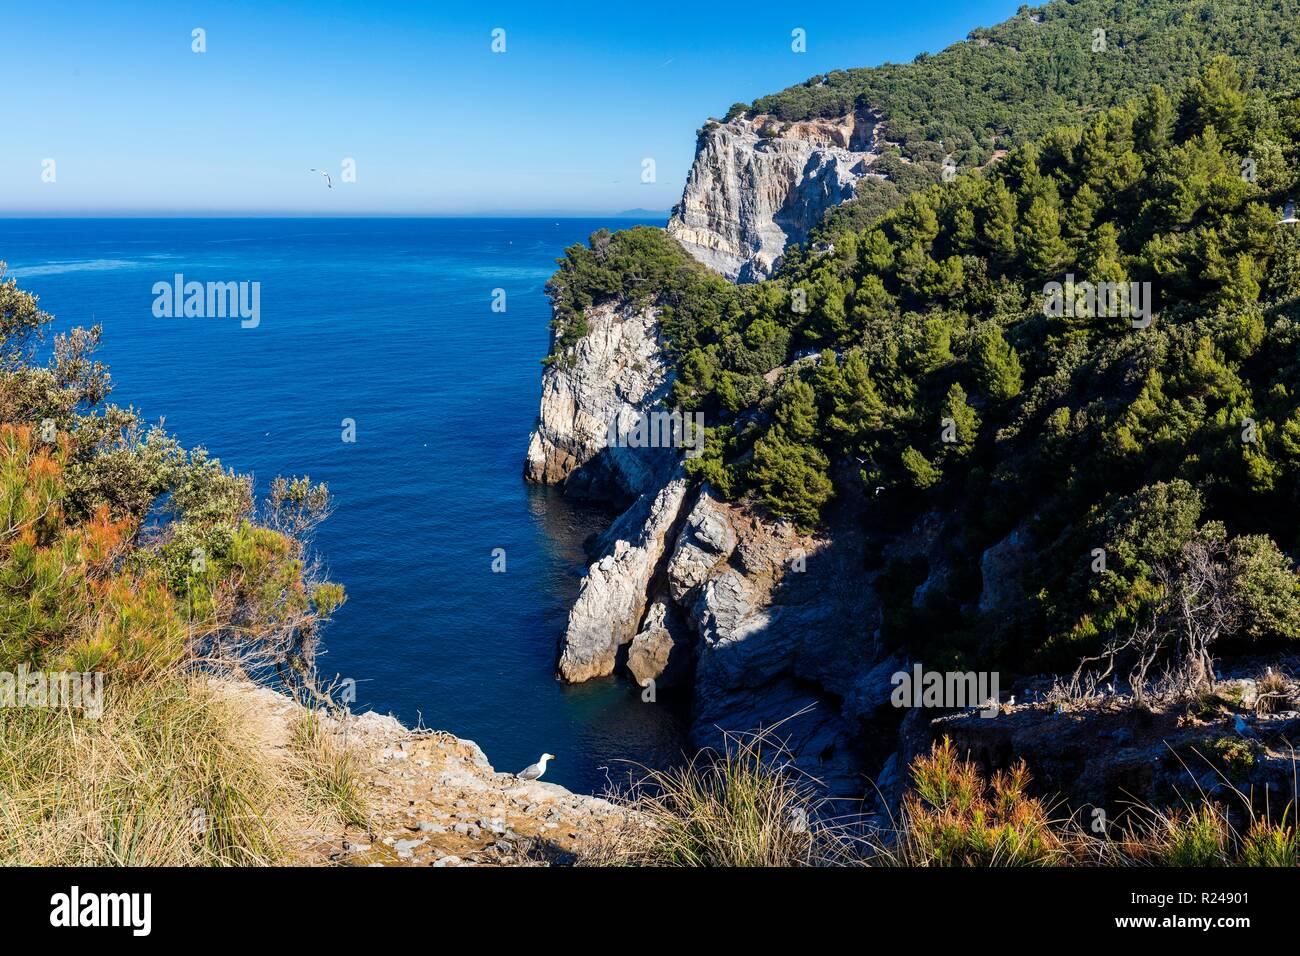 Palmaria Island Liguria Stock Photos  Palmaria Island